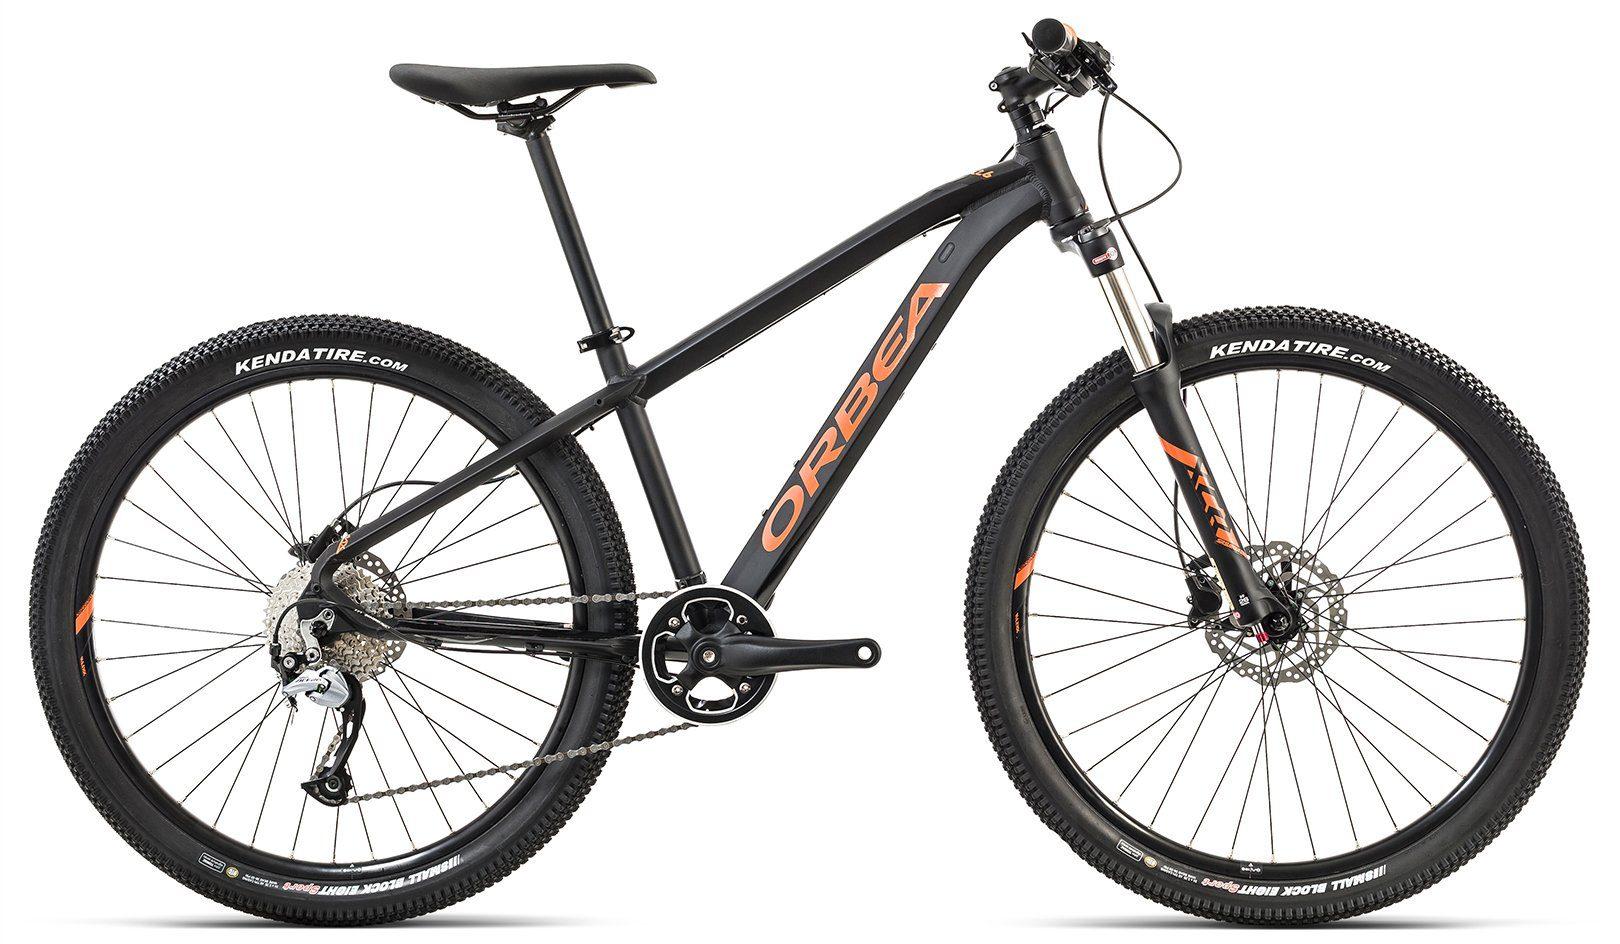 ORBEA Hardtail Mountainbike, 26 Zoll, 9 Gang Shimano Acera Kettenschaltung, »MX 26 Team«